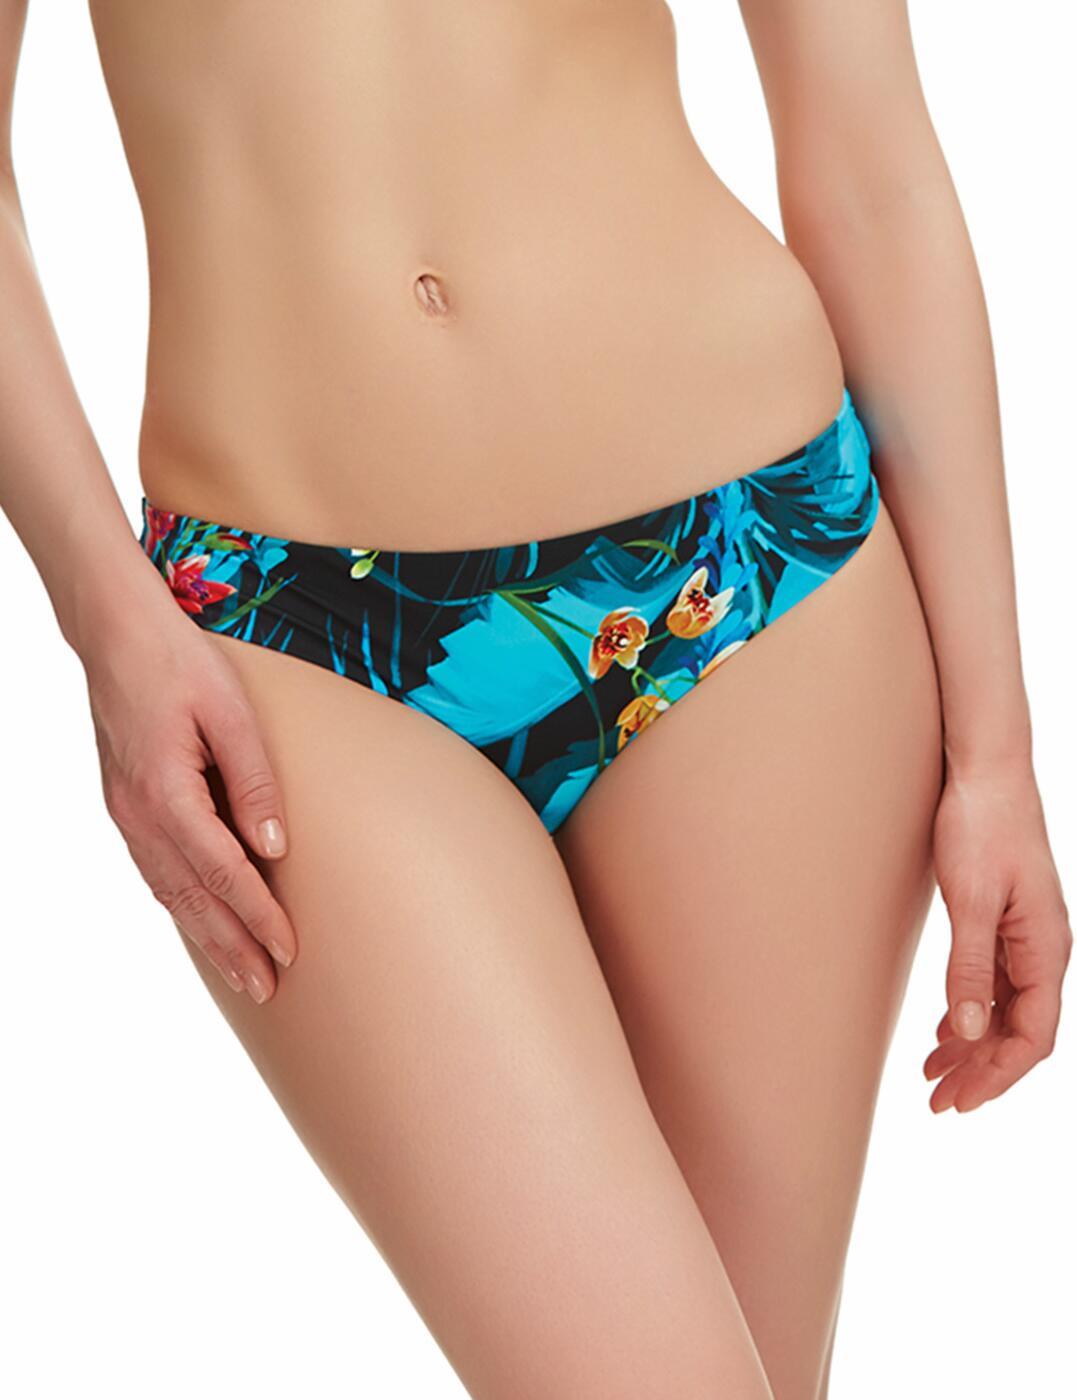 6108 Fantasie Seychelles Low Rise Bikini Brief Azure - 6108 Low Rise Brief